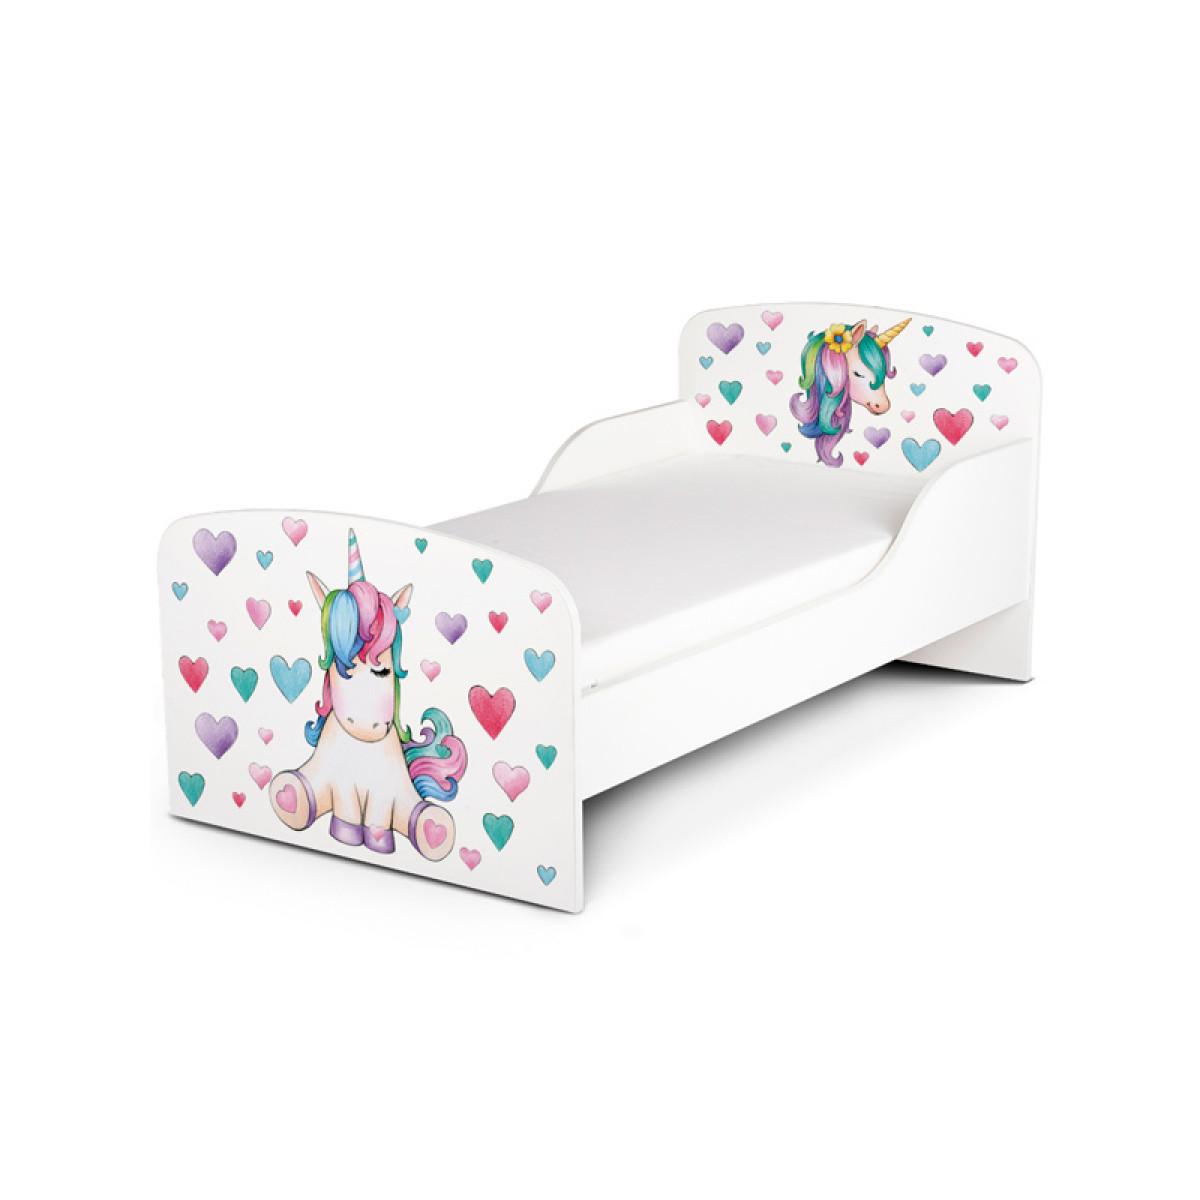 Lol Surprise Furniture Bedroom Novocom Top